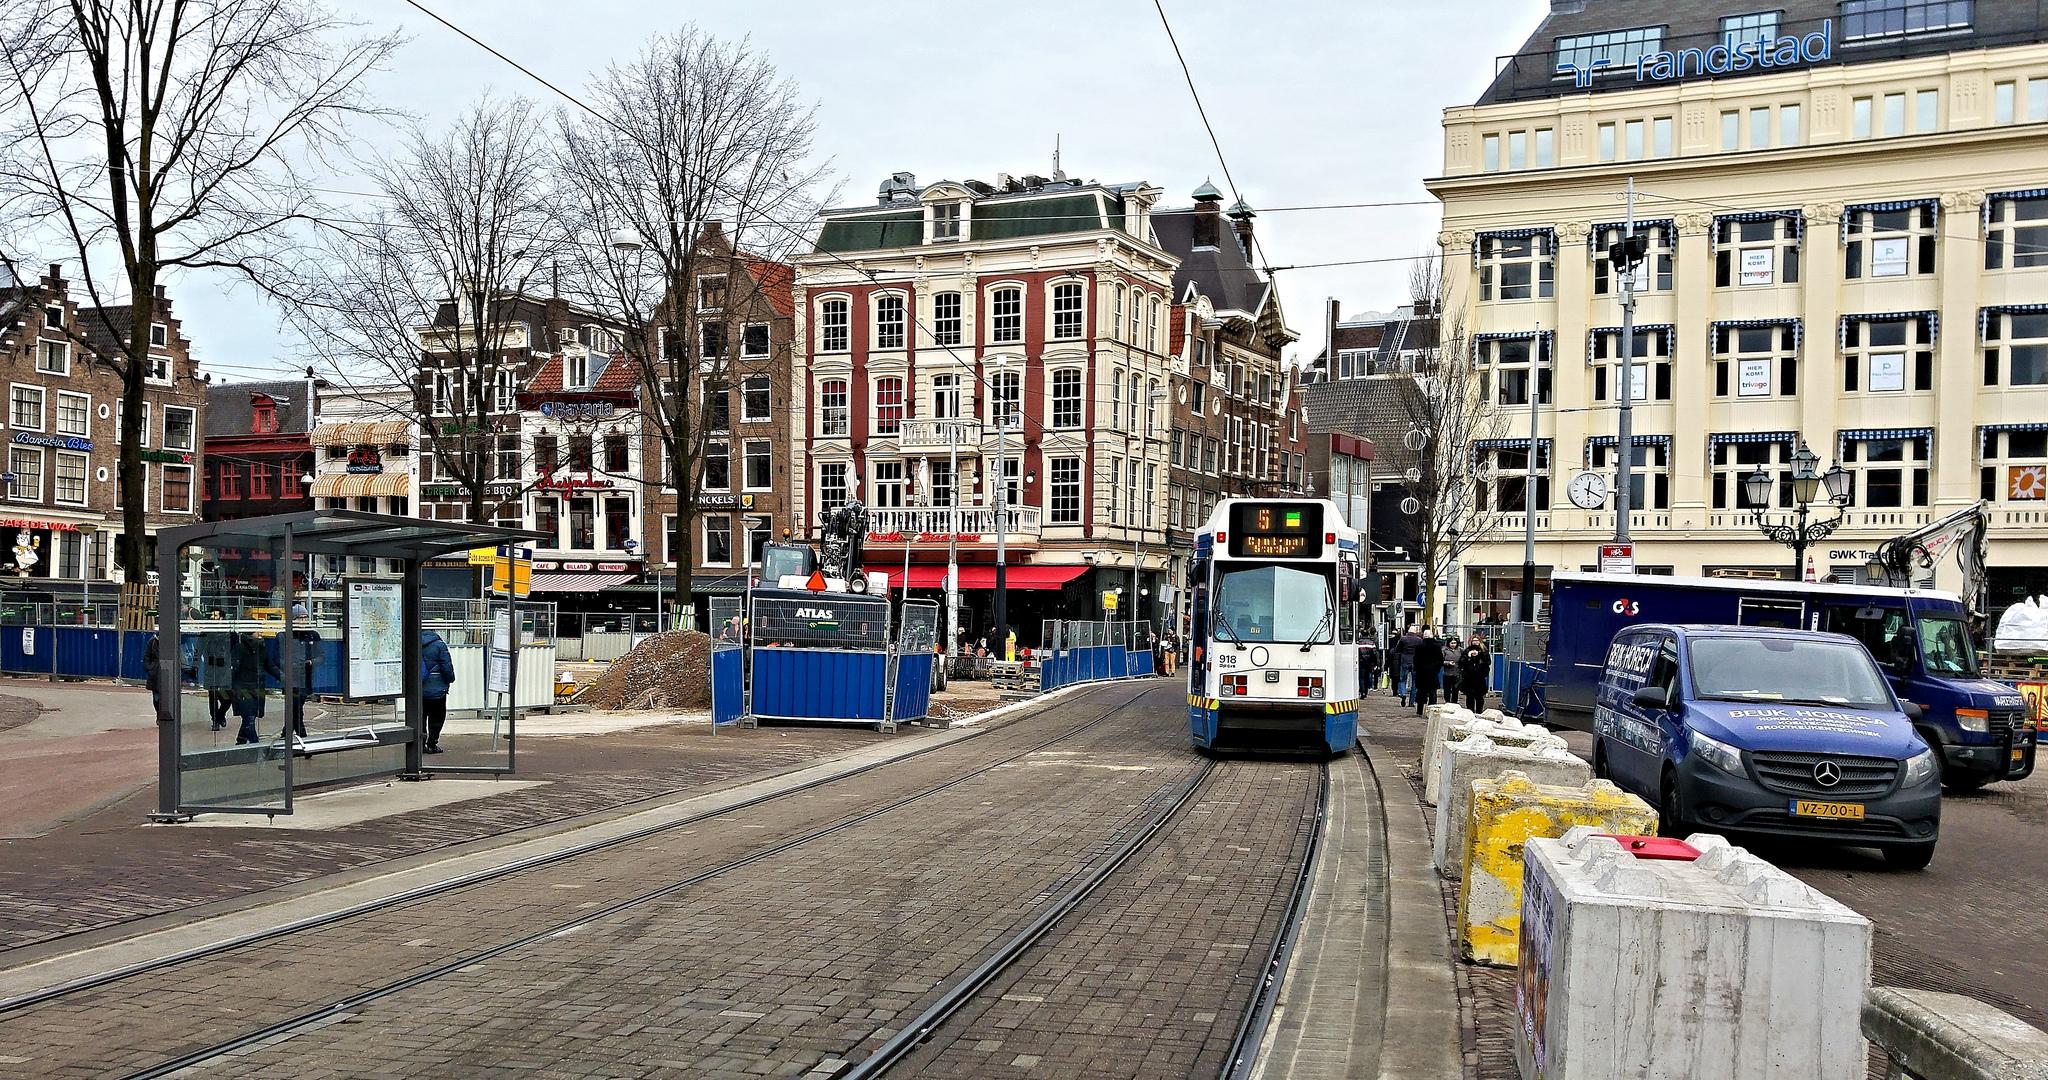 Трамвай на площади Лейдсеплейн, Амстердам